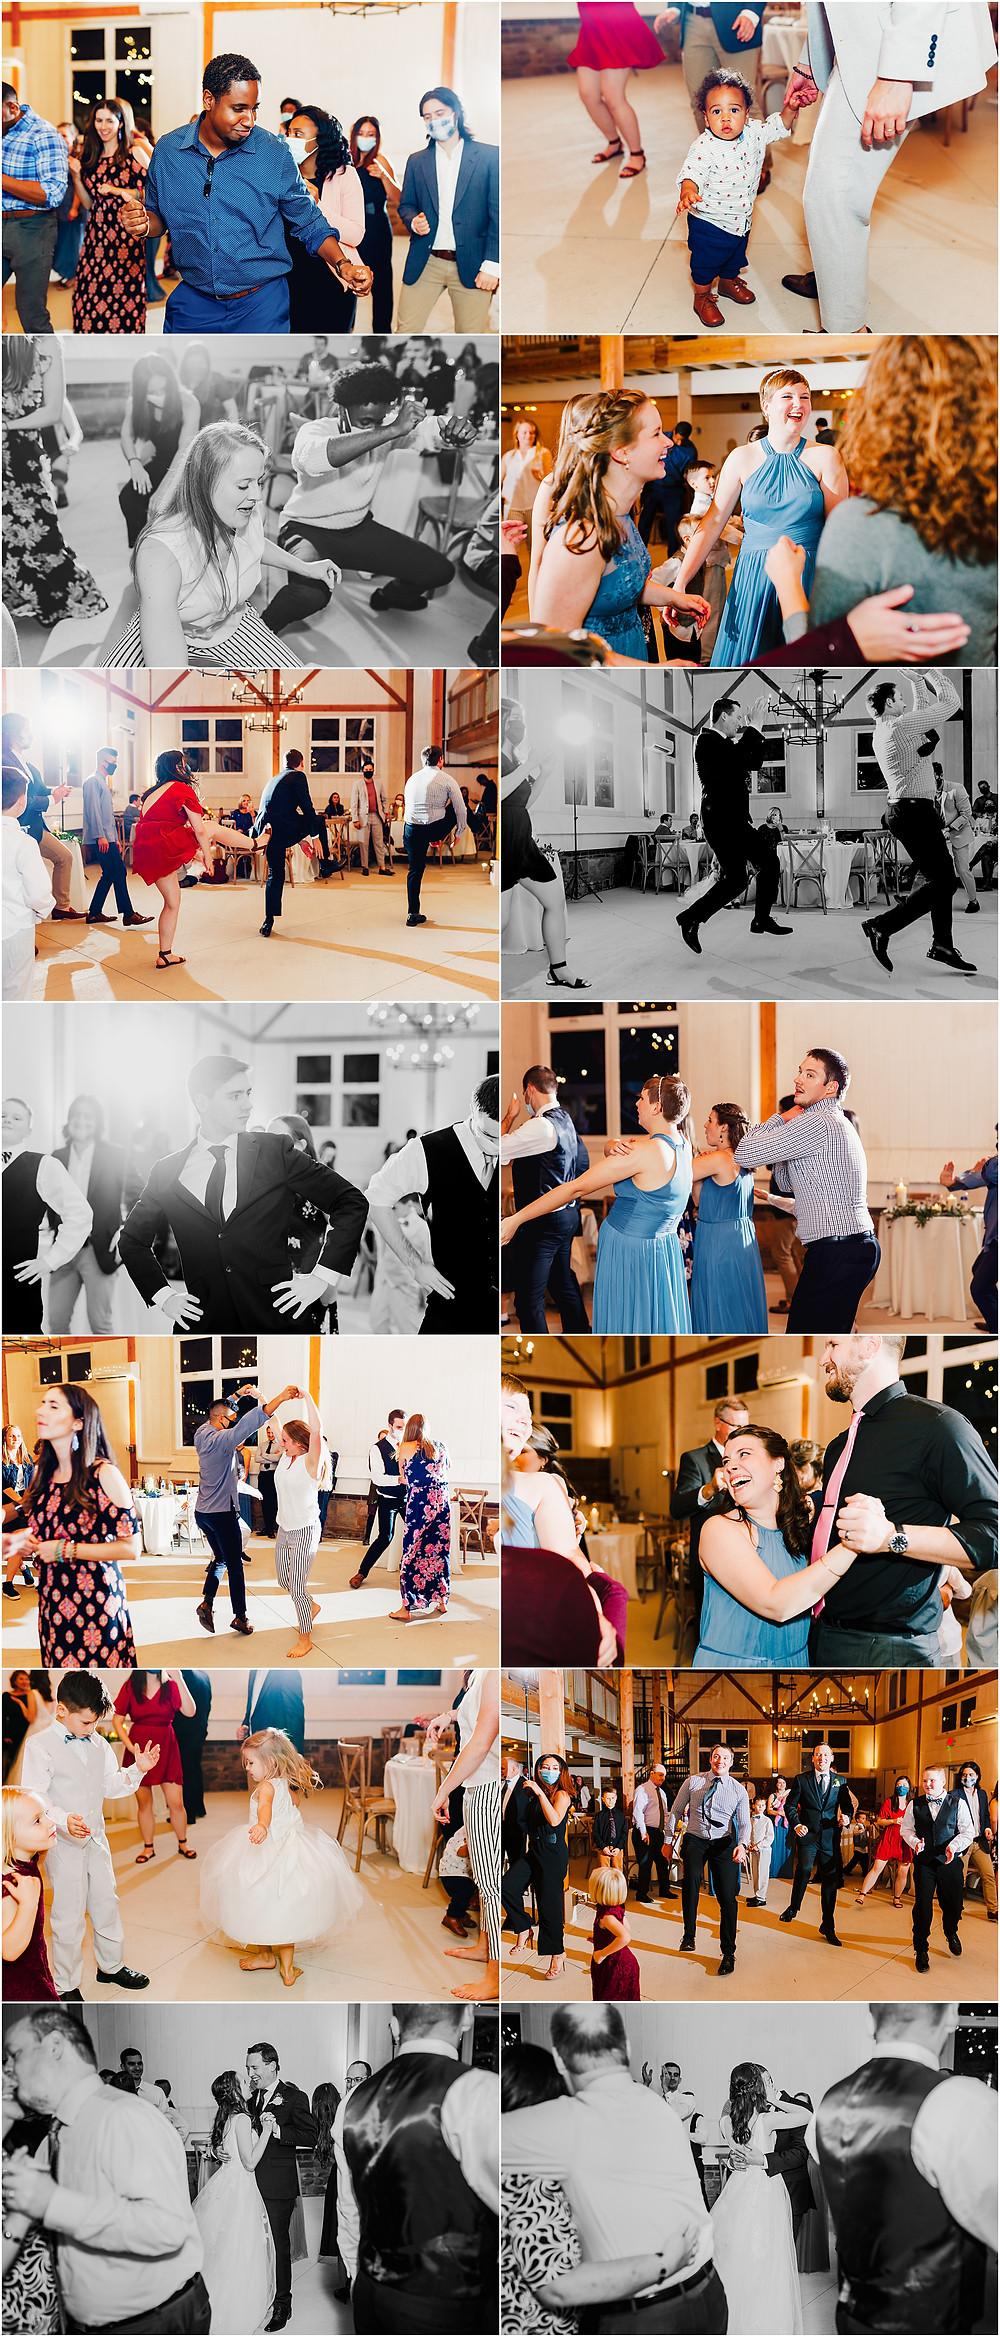 Tannery barn wedding reception dance photos maryland wedding photographer